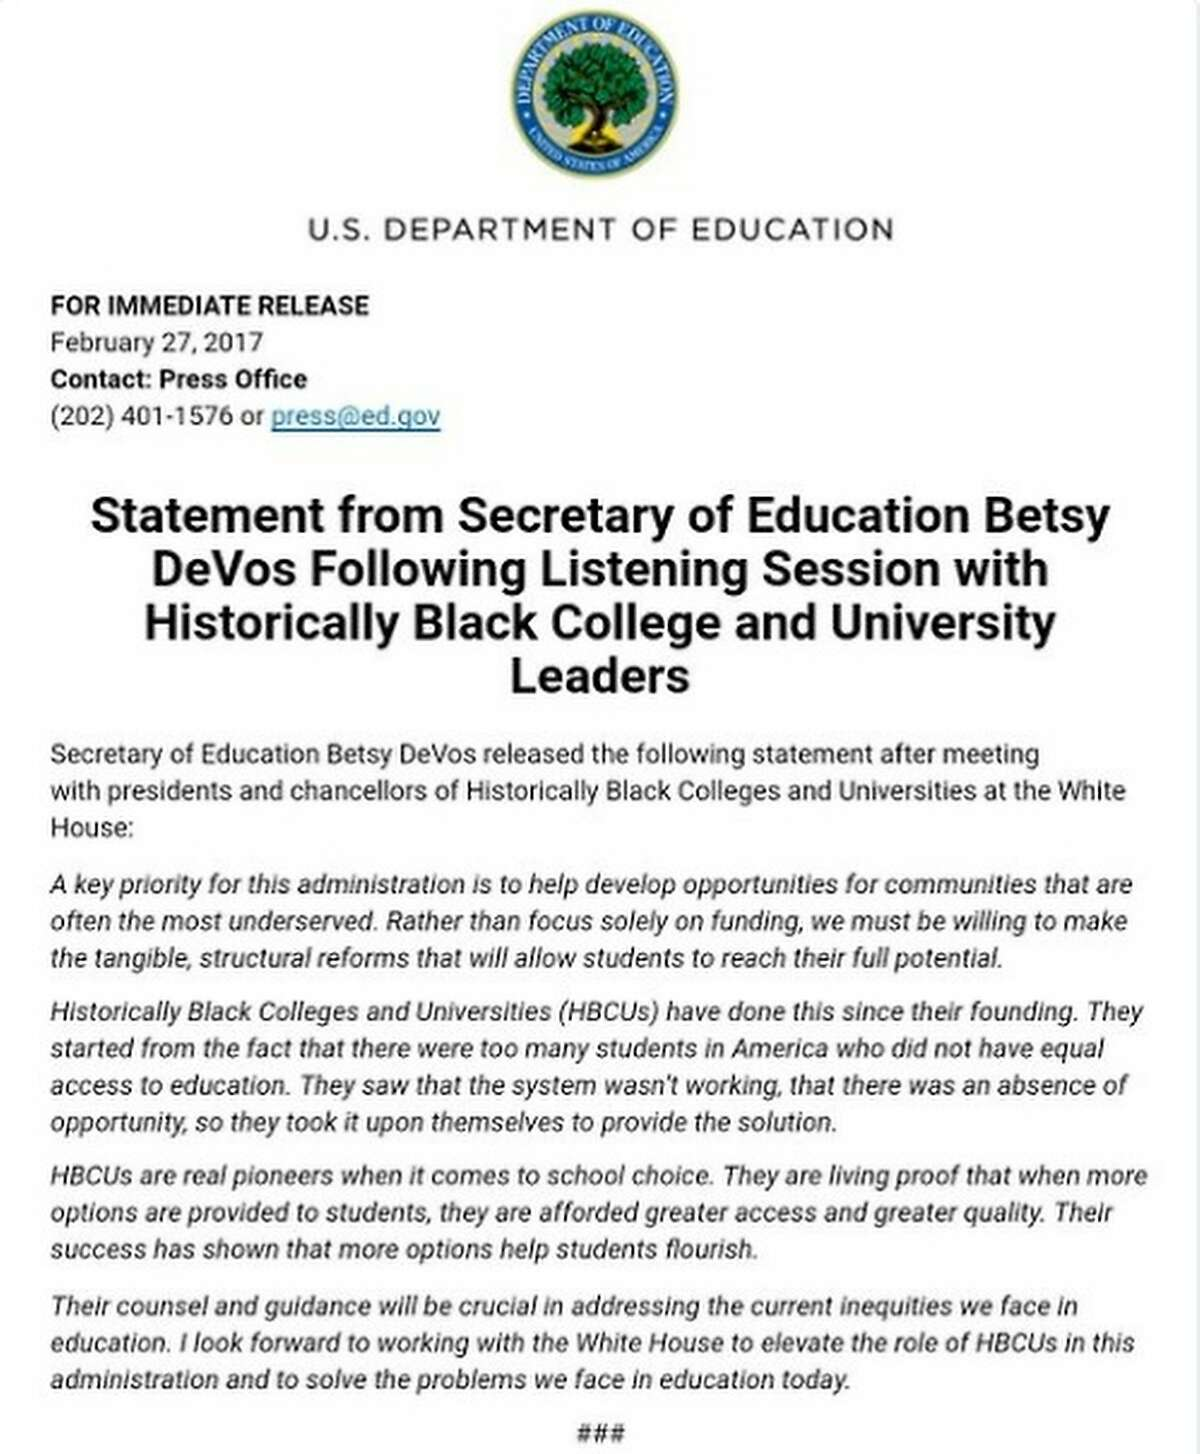 Betsy DeVos' press release regarding HBCUs. NEXT: Ranking HBCUs by starting salaries of graduates.